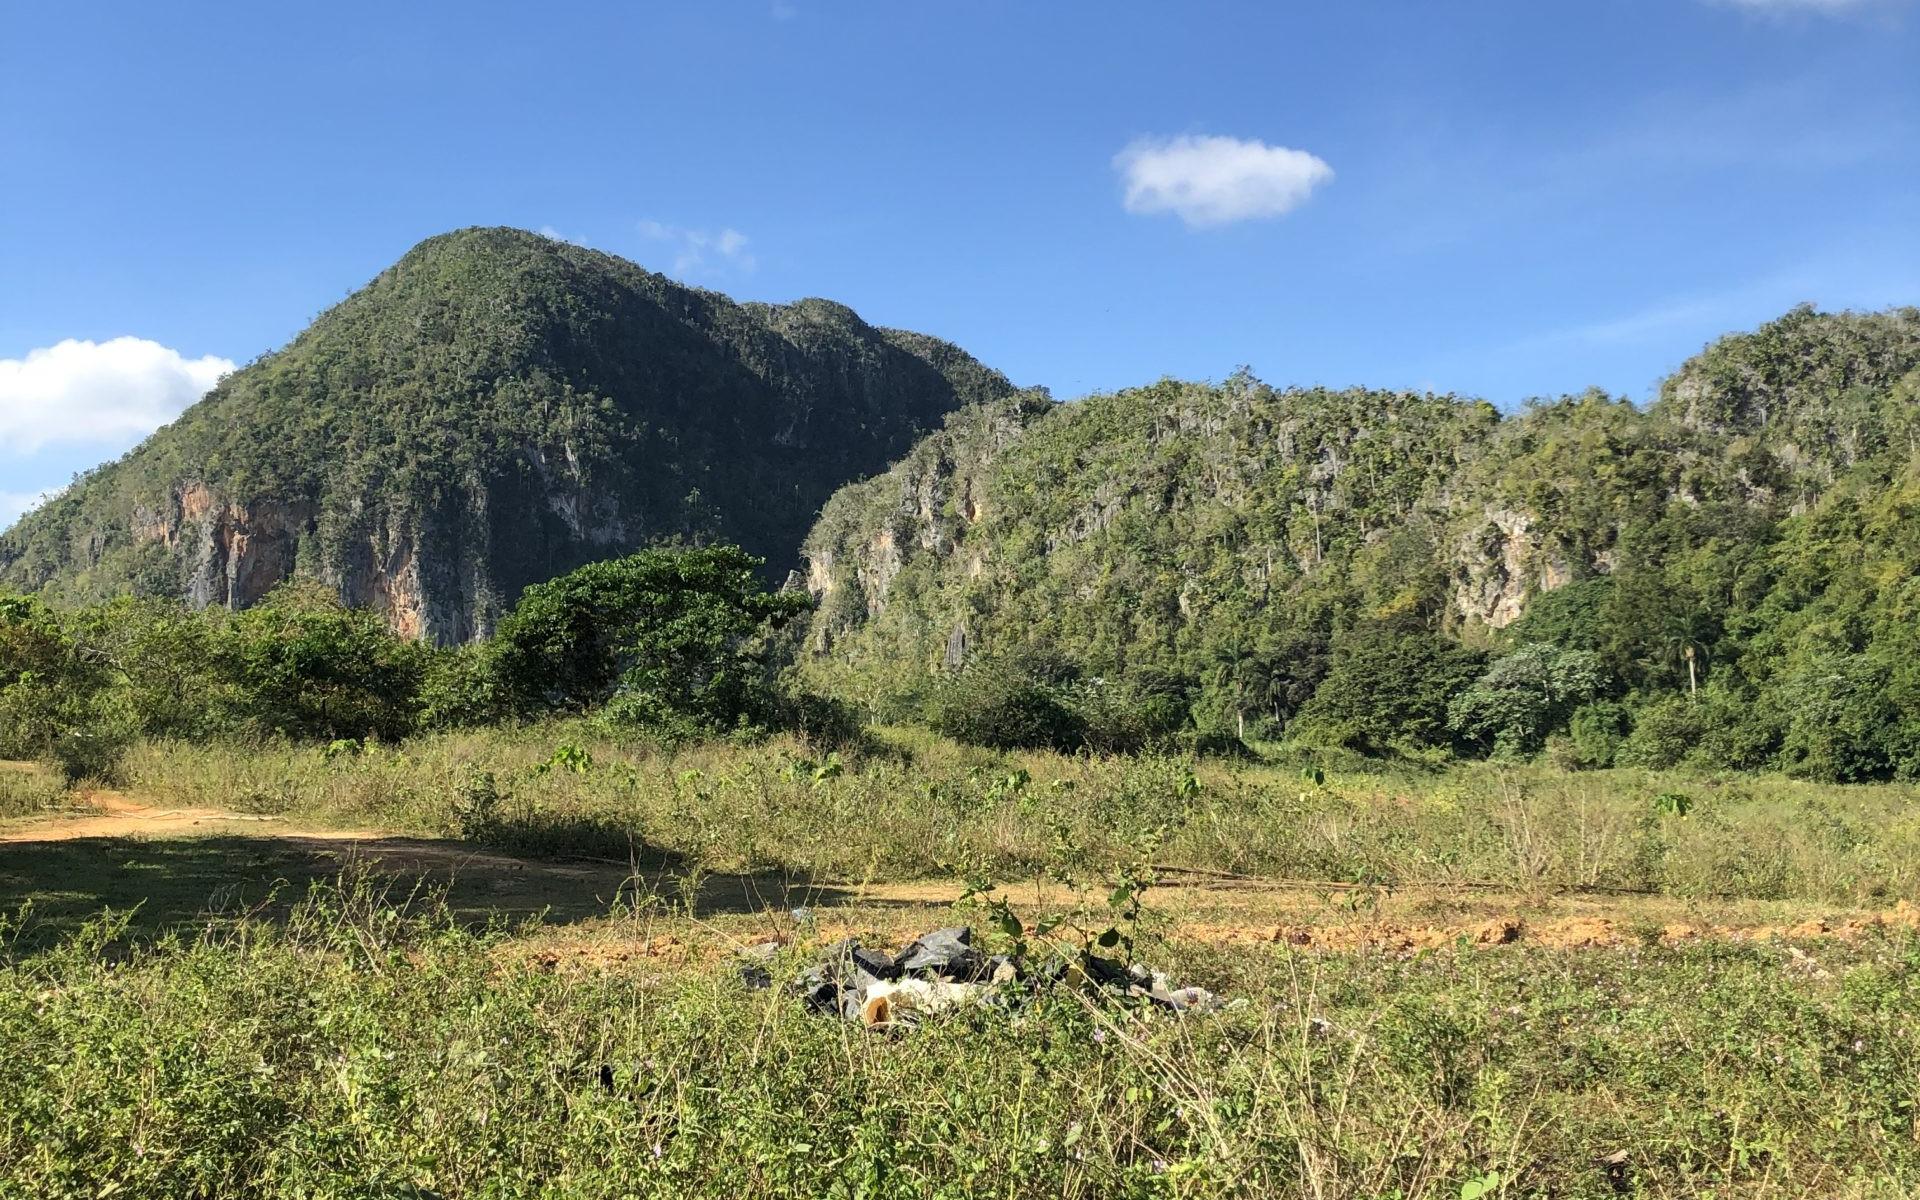 Rundreise durch Kuba Etappe 1 Valle de Viñales 1